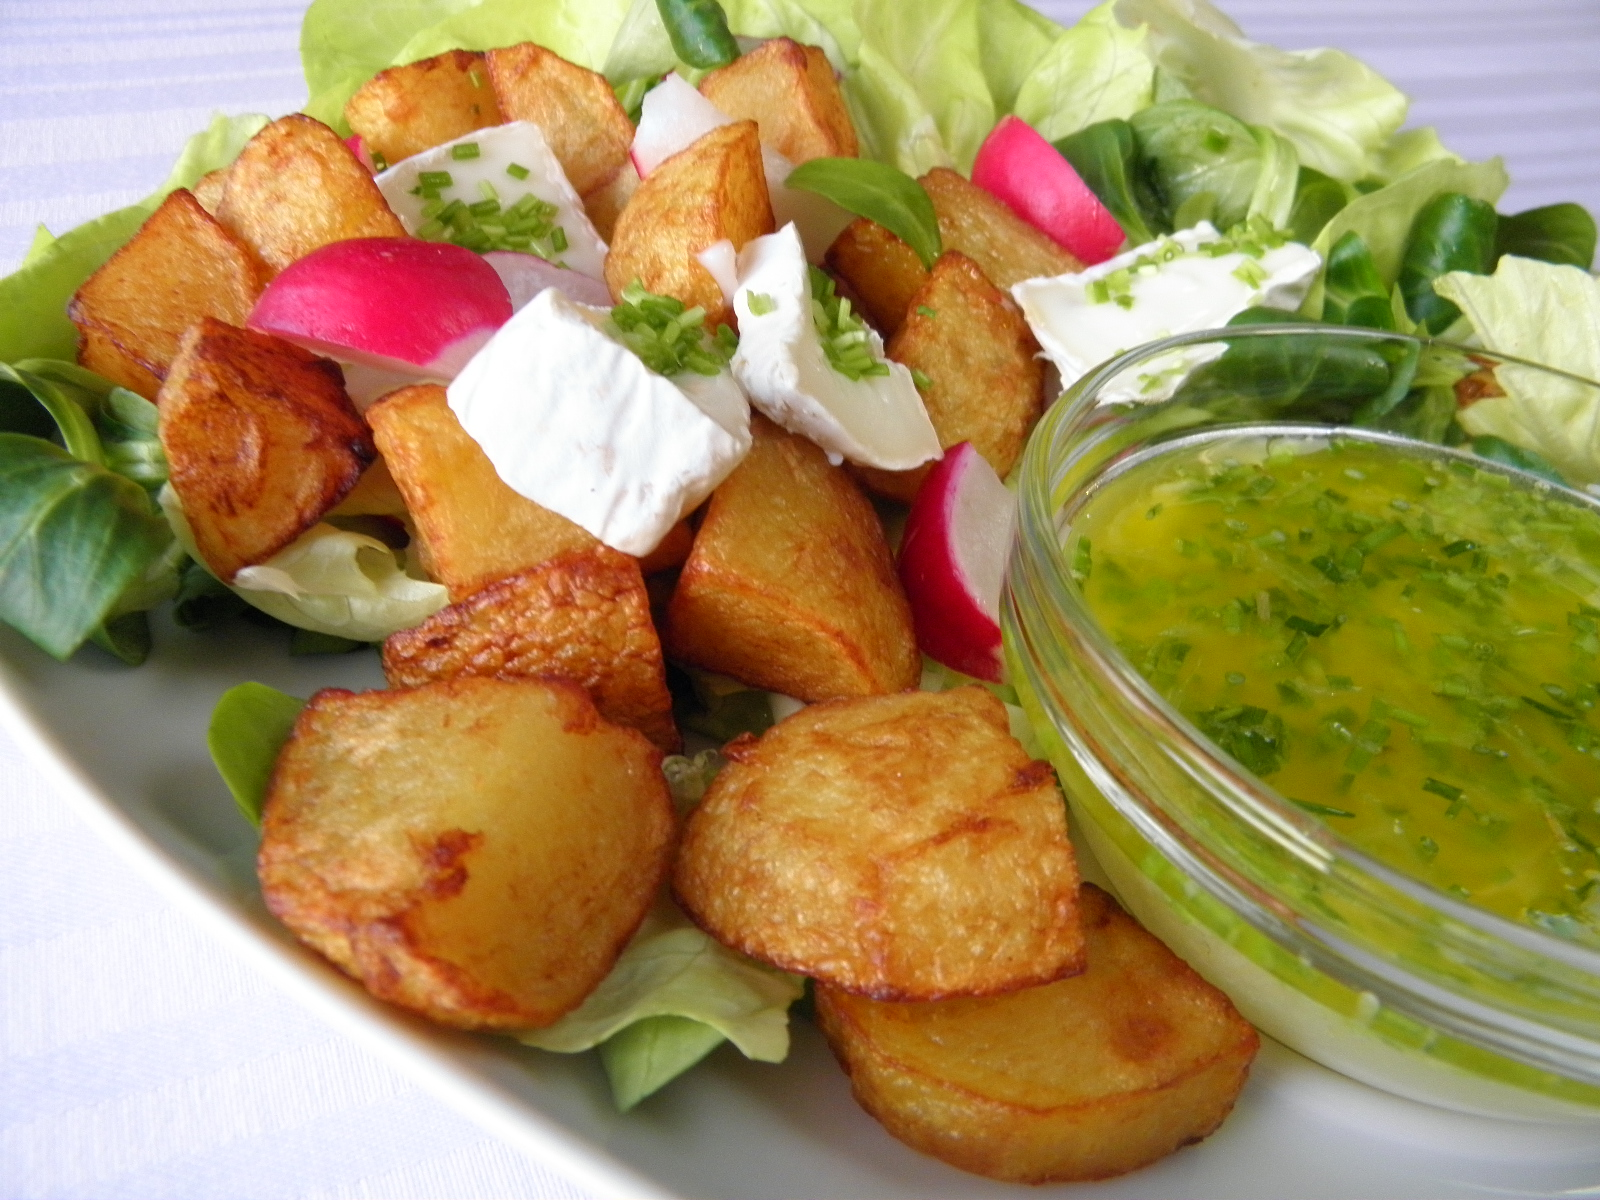 Zeleninový salát s bramborem a sýrem